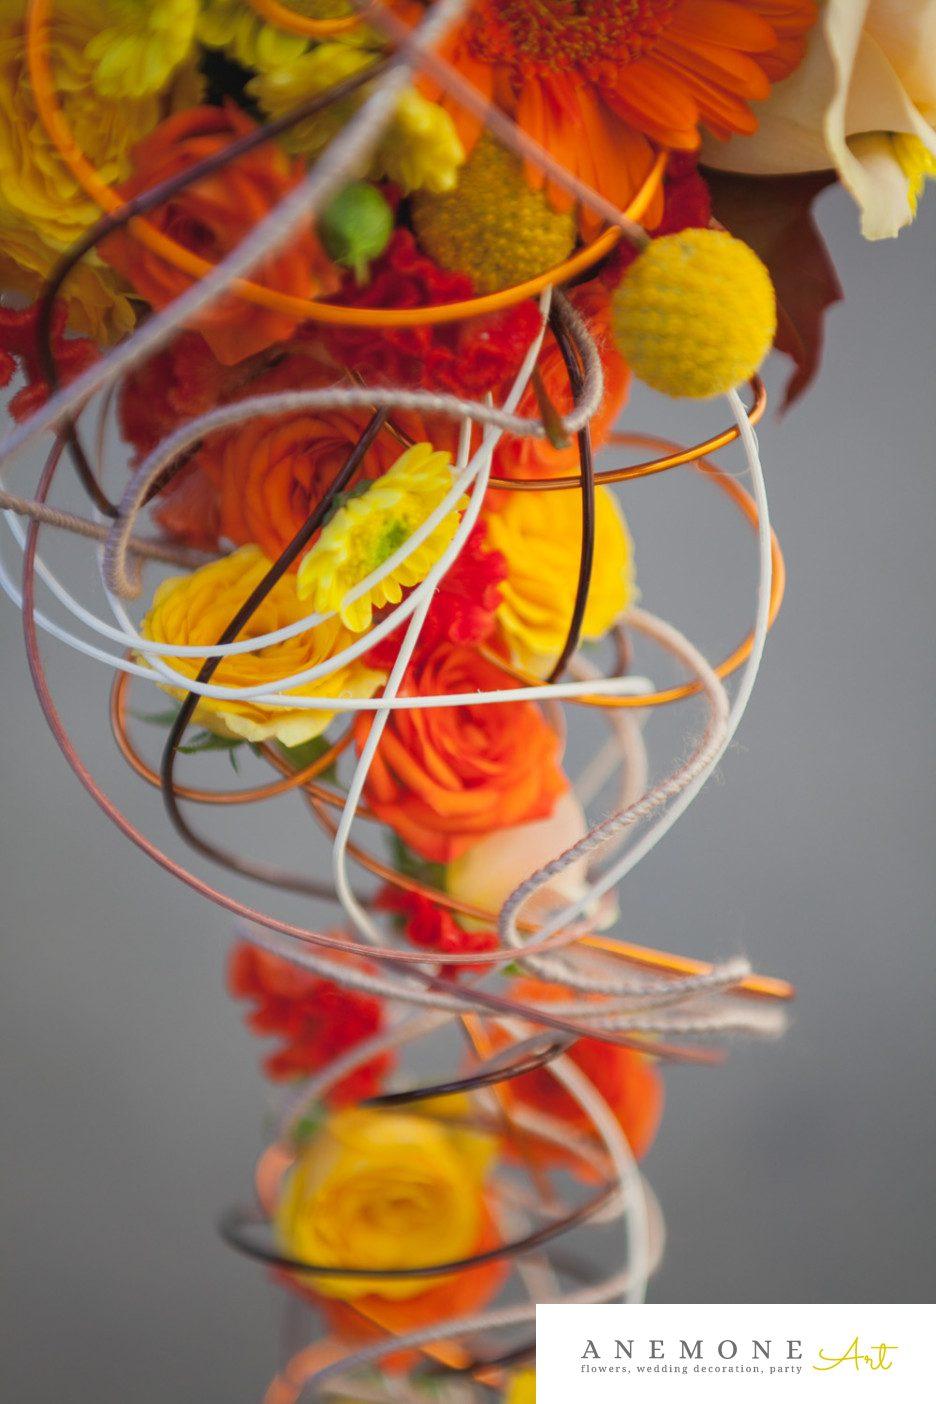 Poza, foto cu Flori de nunta buchet mireasa, celosia, craspedia, crizanteme, galben, maci, mini-gerbera, mini-rosa, portocaliu, trandafiri in Arad, Timisoara, Oradea (wedding flowers, bouquets) nunta Arad, Timisoara, Oradea